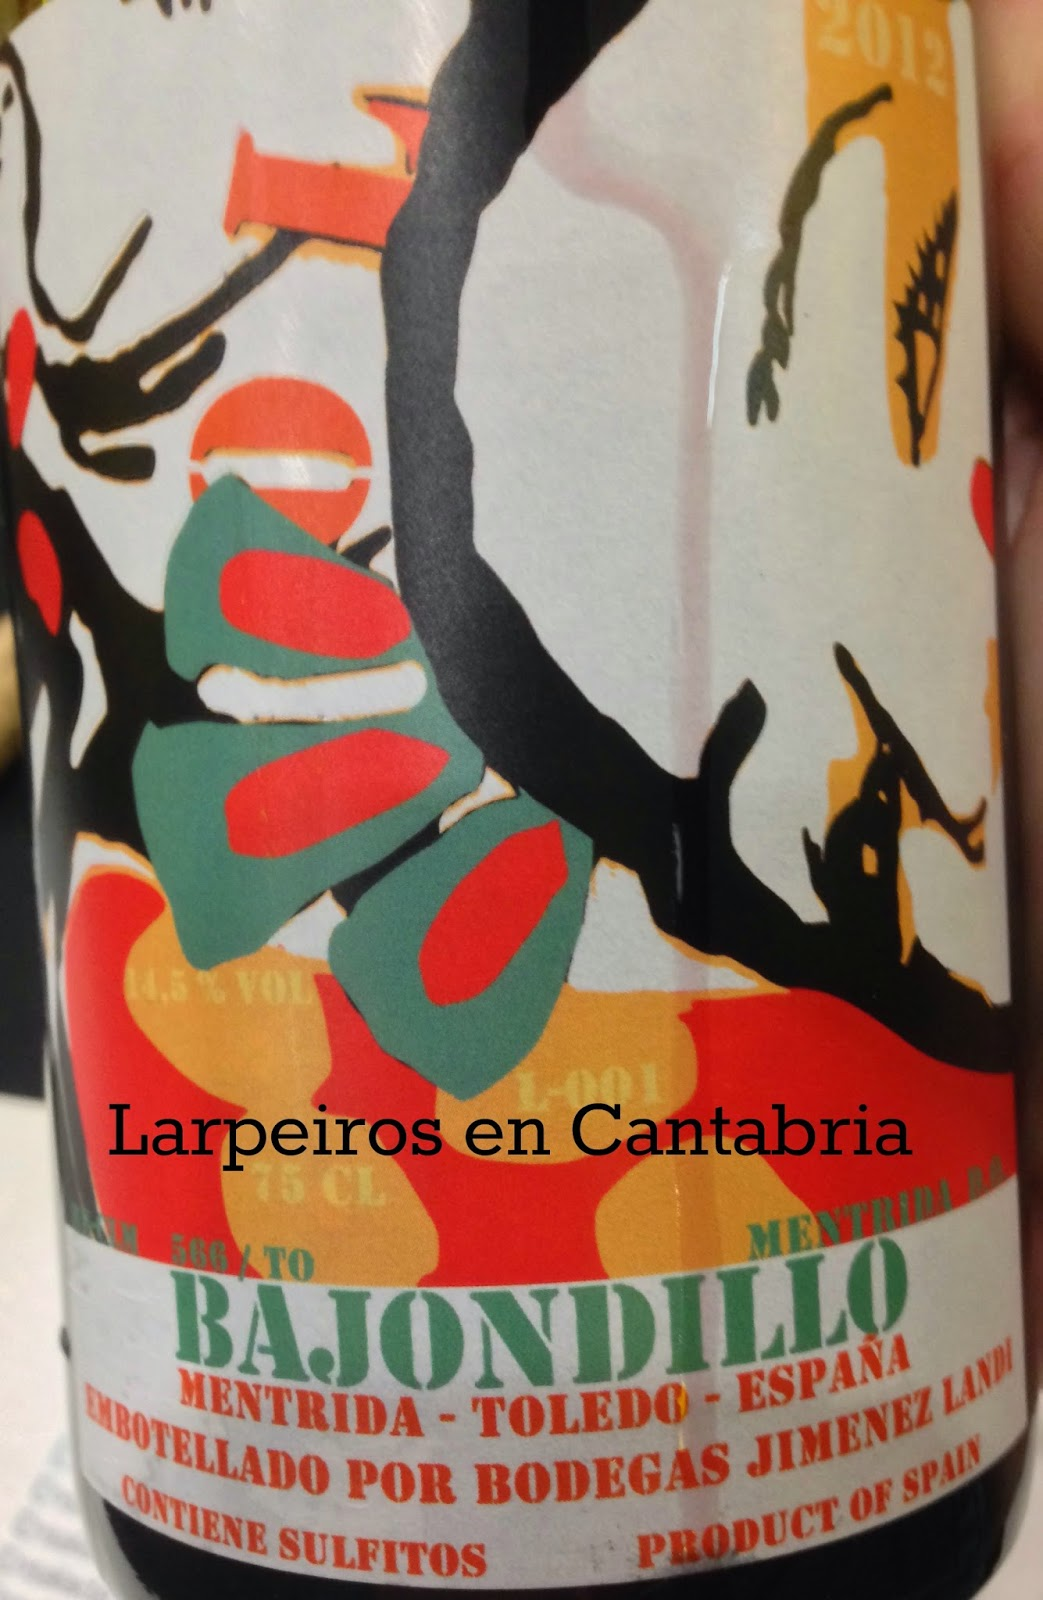 Vino Tinto Bajondillo 2012: Recordando a Daniel